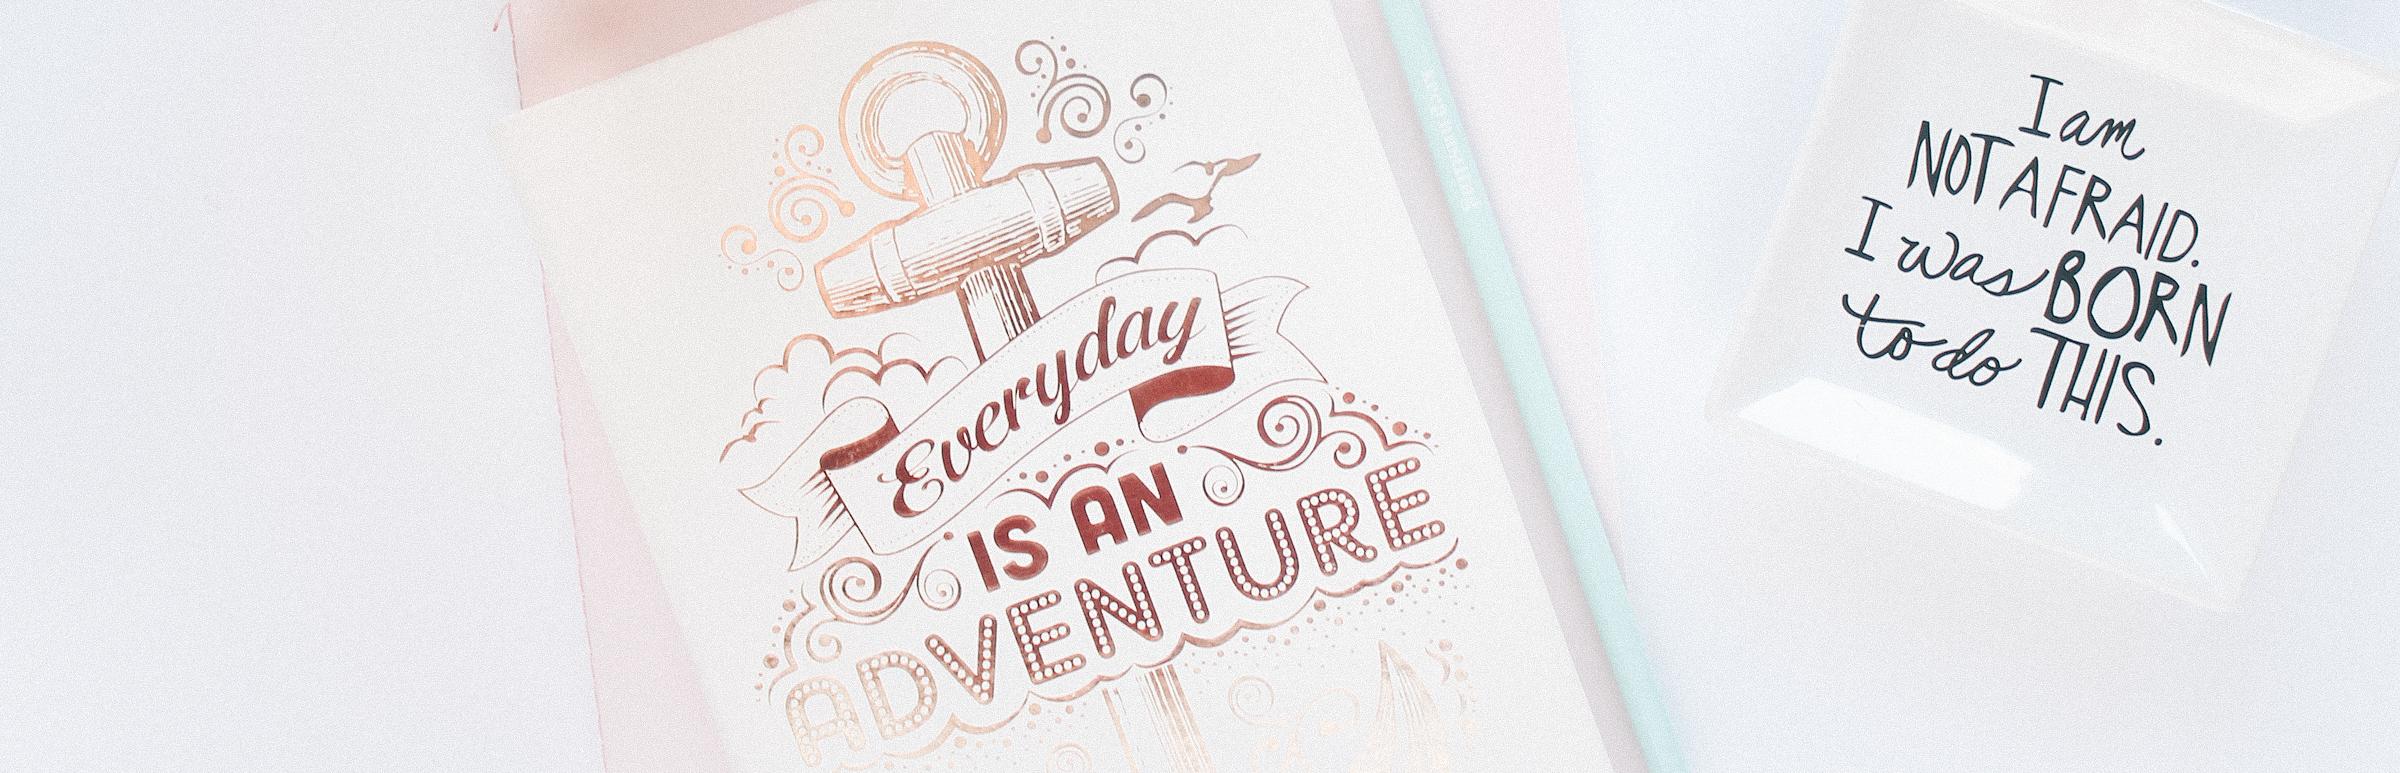 PBD-Everyday-Adventure-3.jpg